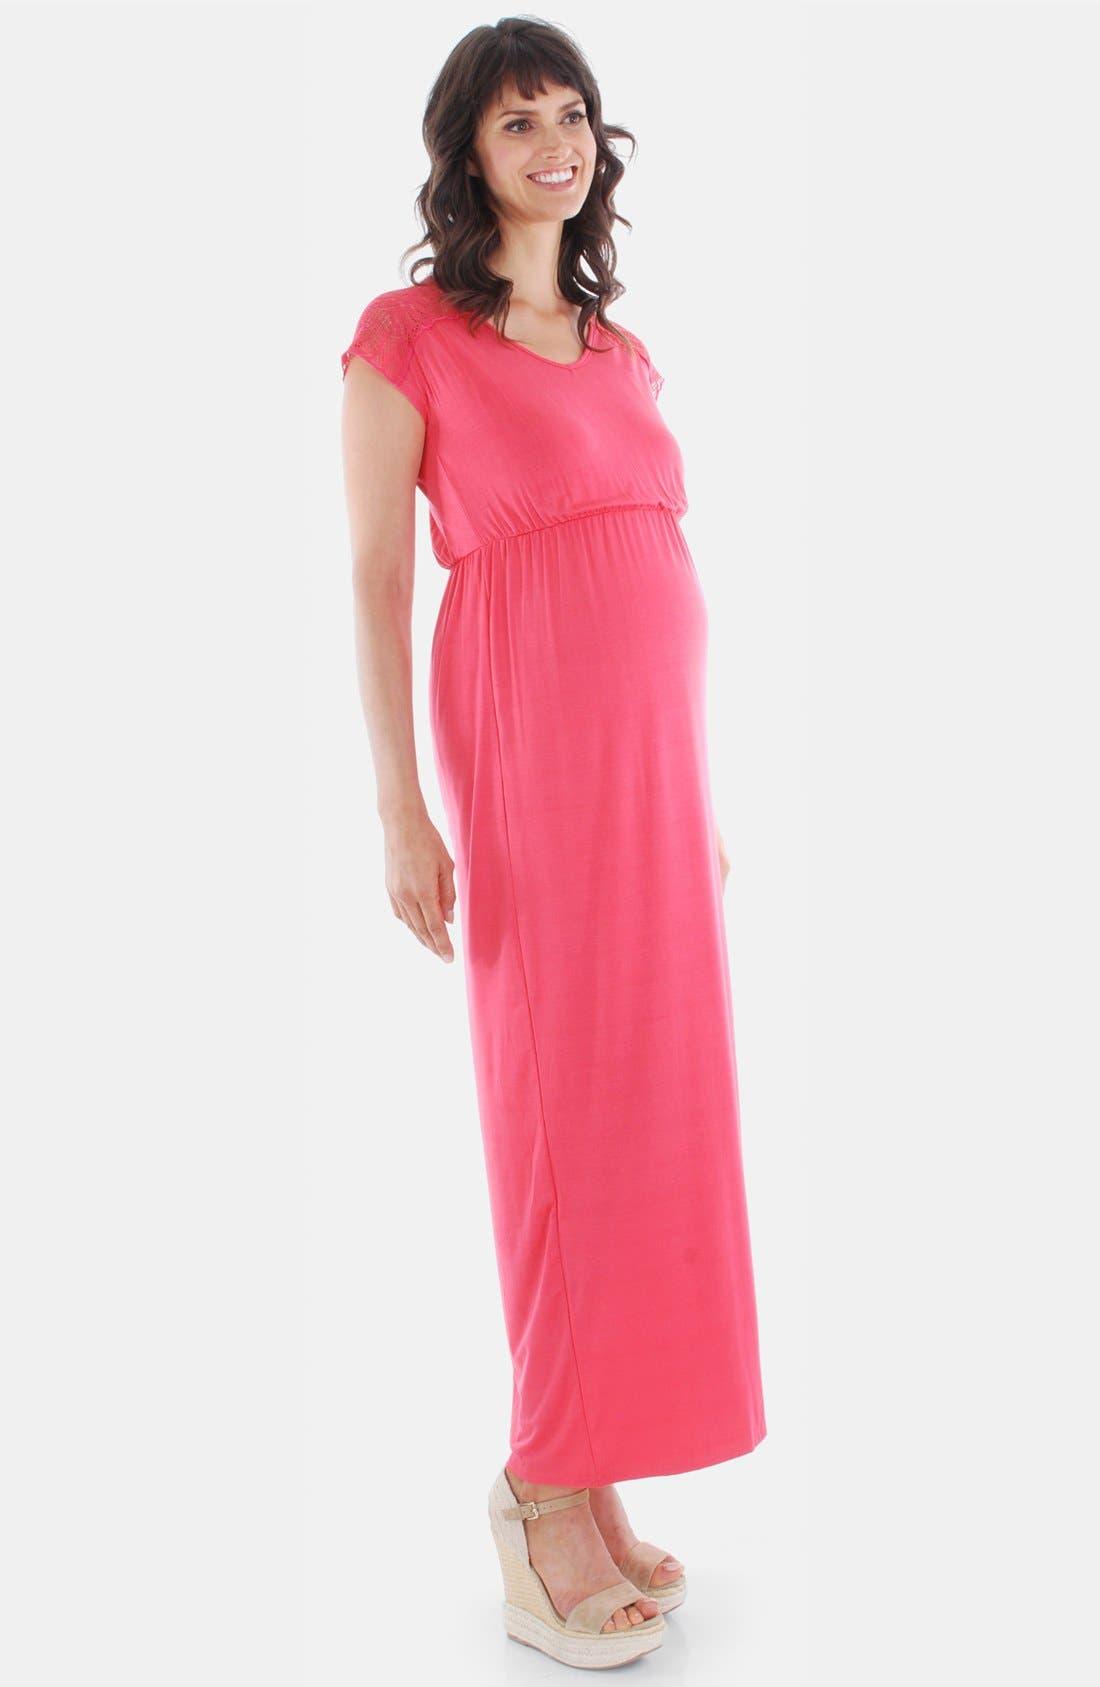 Alternate Image 1 Selected - Everly Grey Lace Yoke Maxi Maternity Dress